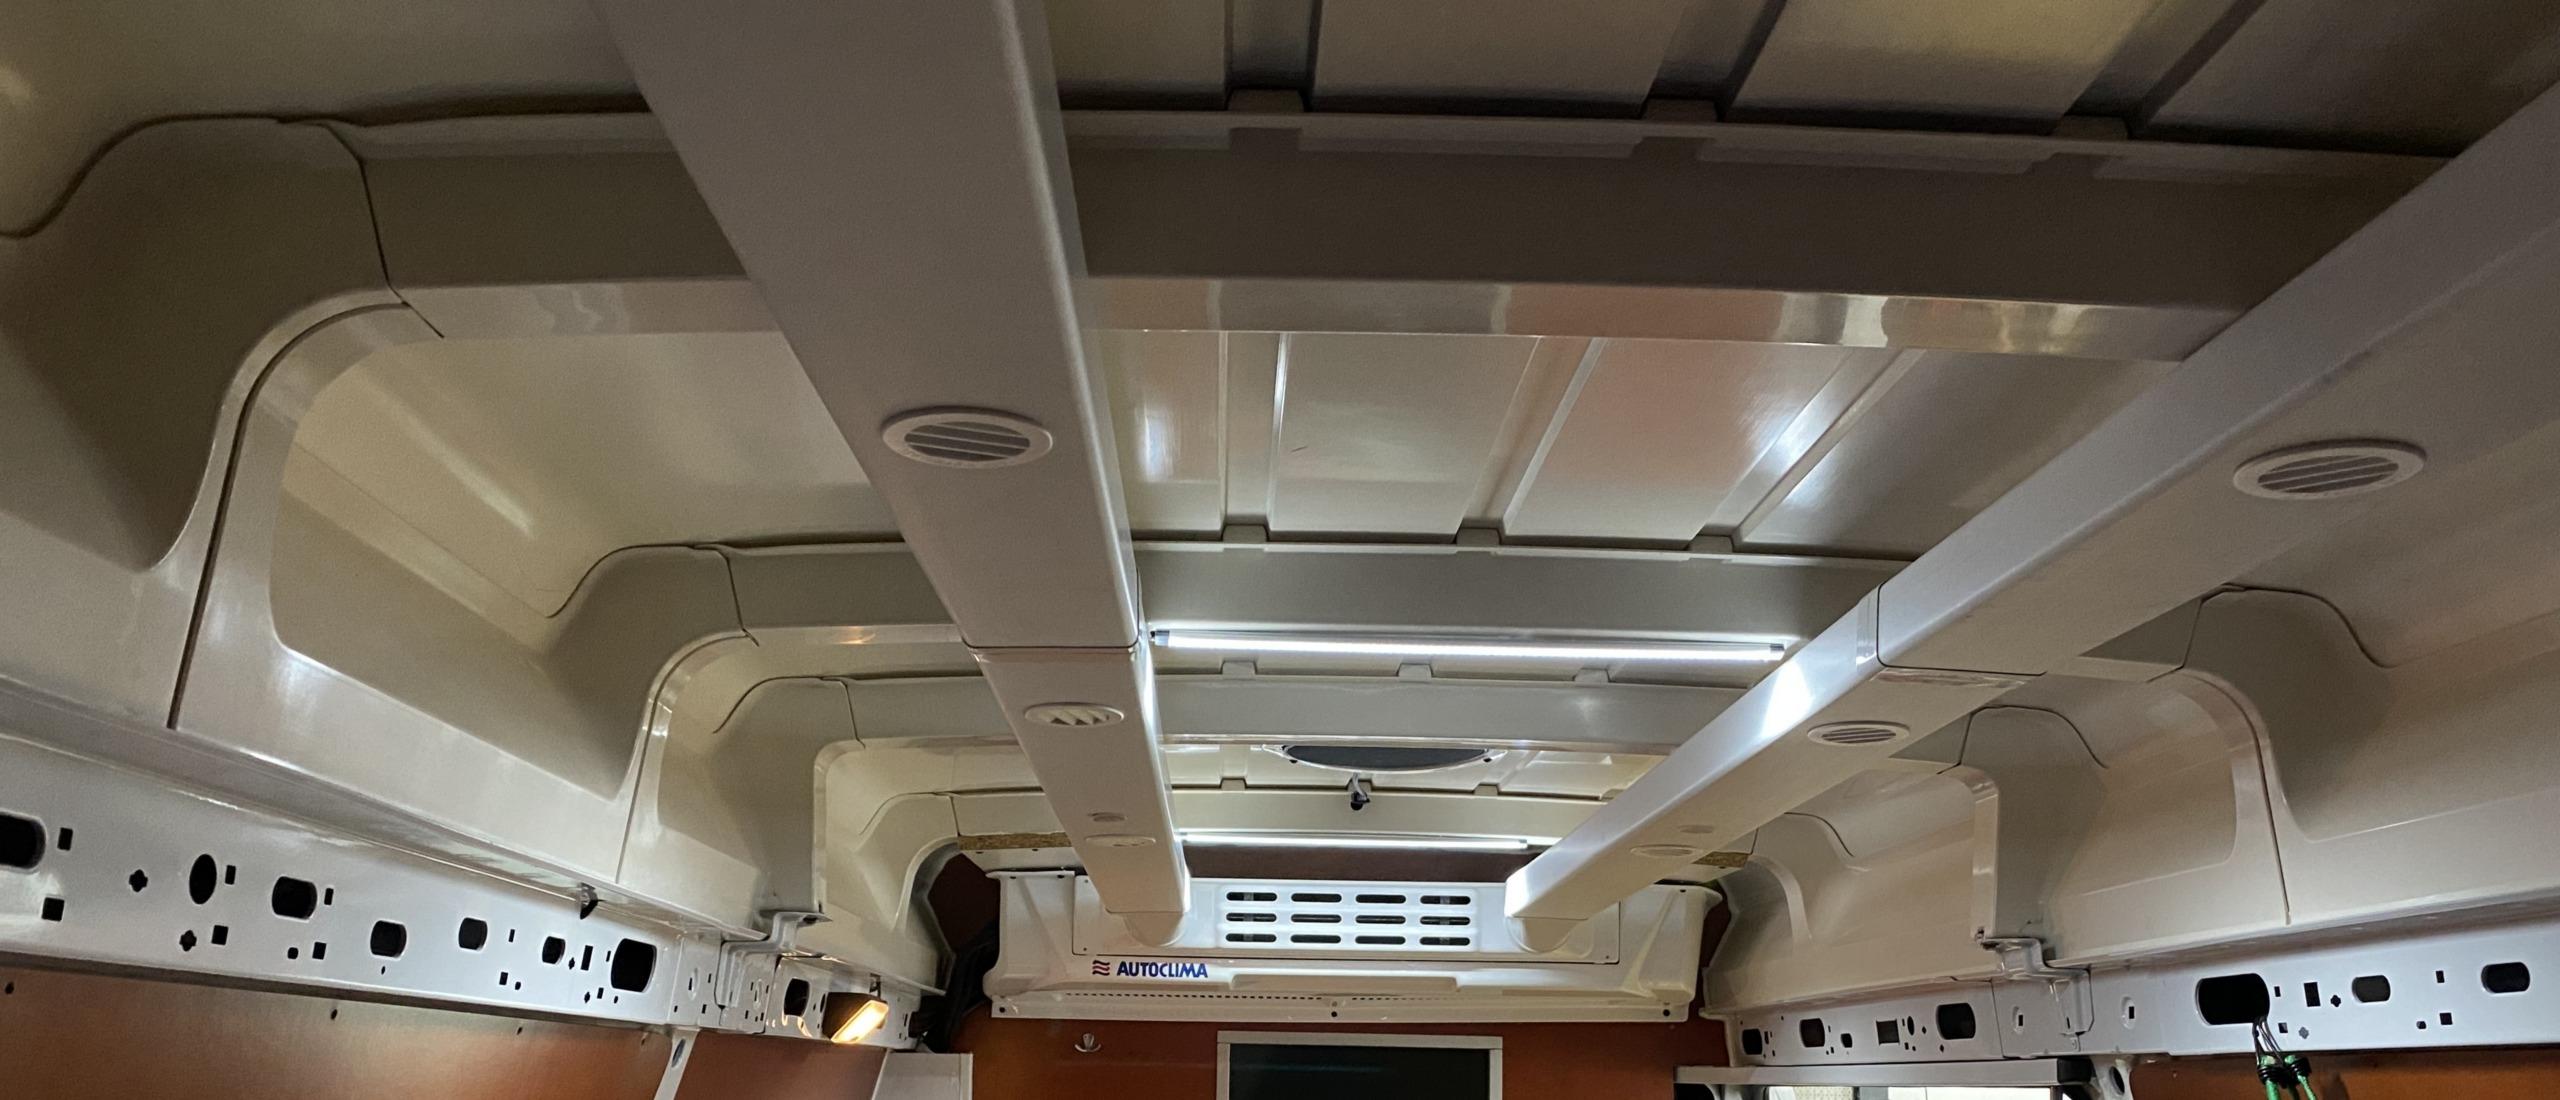 Project: airco-extension voor laadruimte Opel Movano